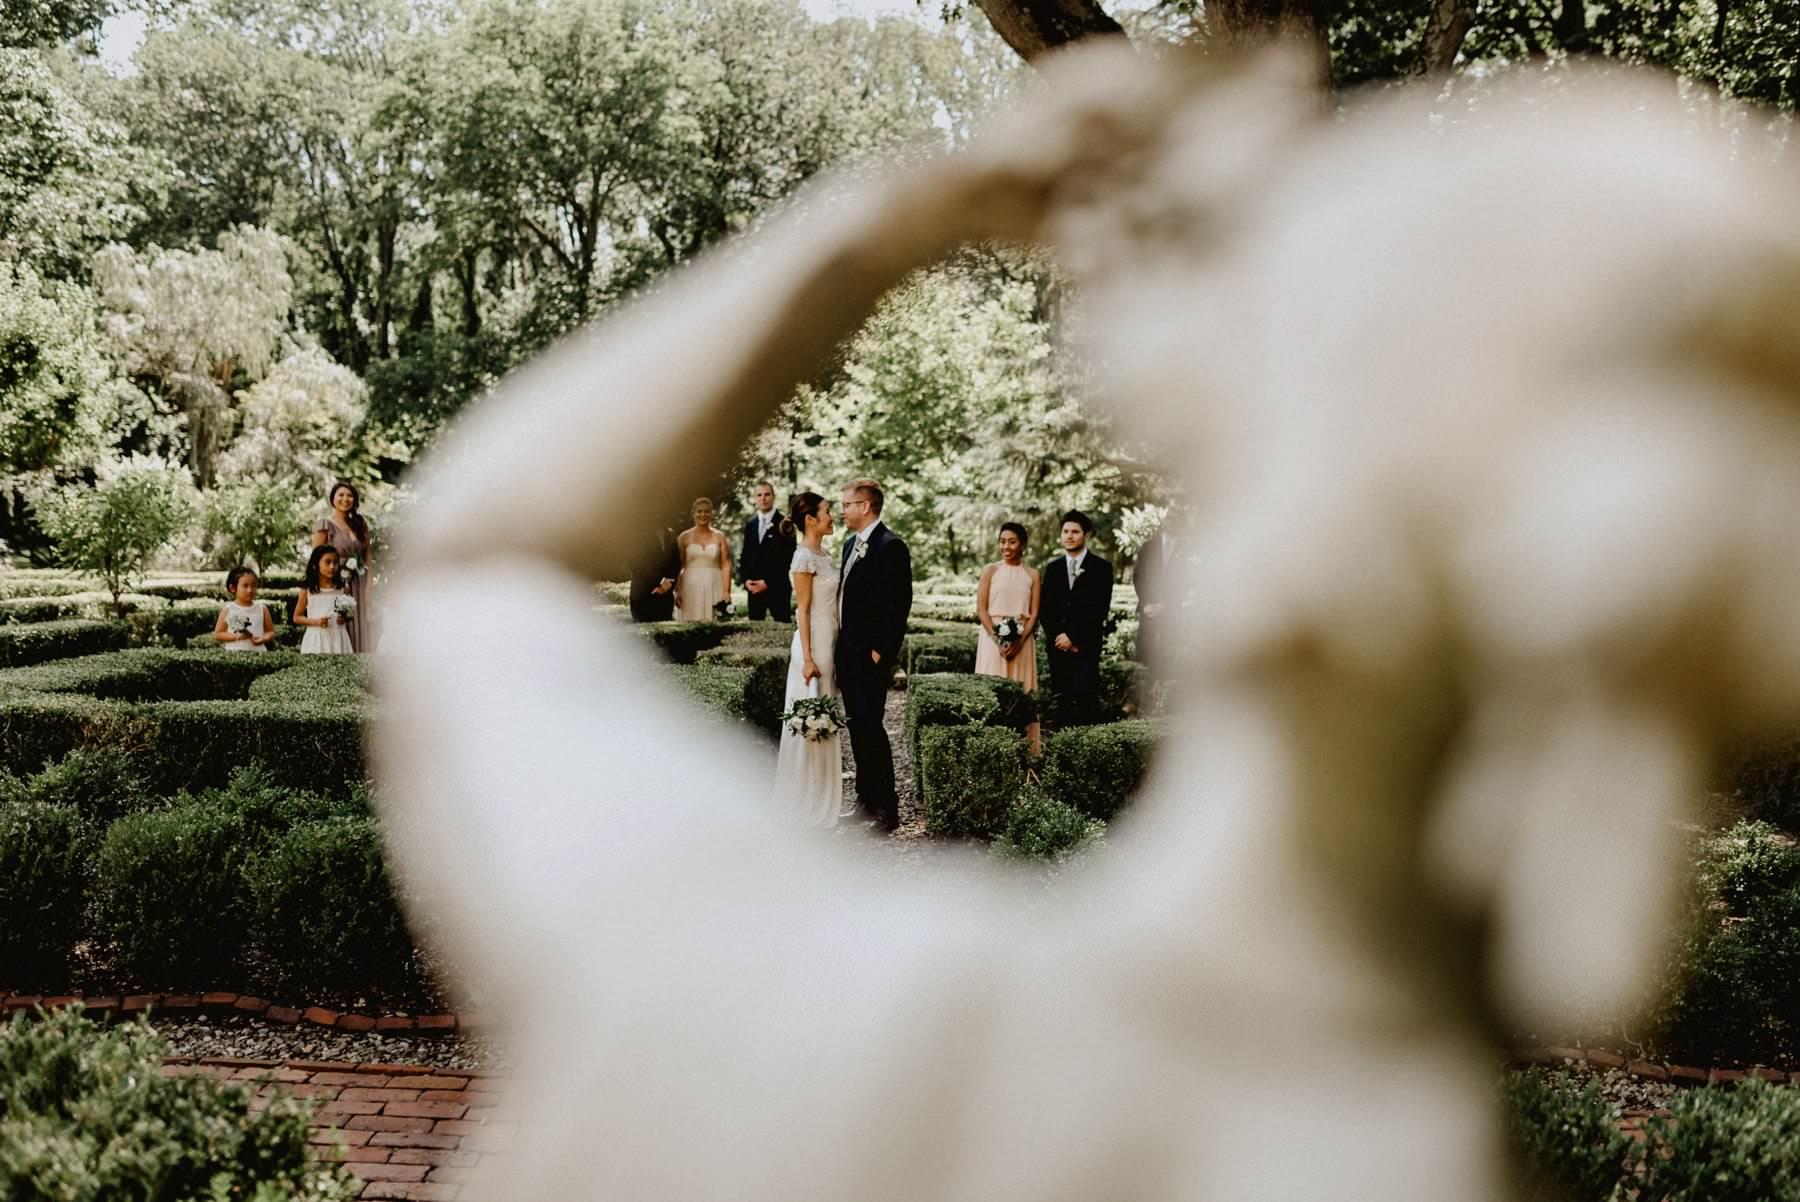 Appleford-estate-wedding-57.jpg